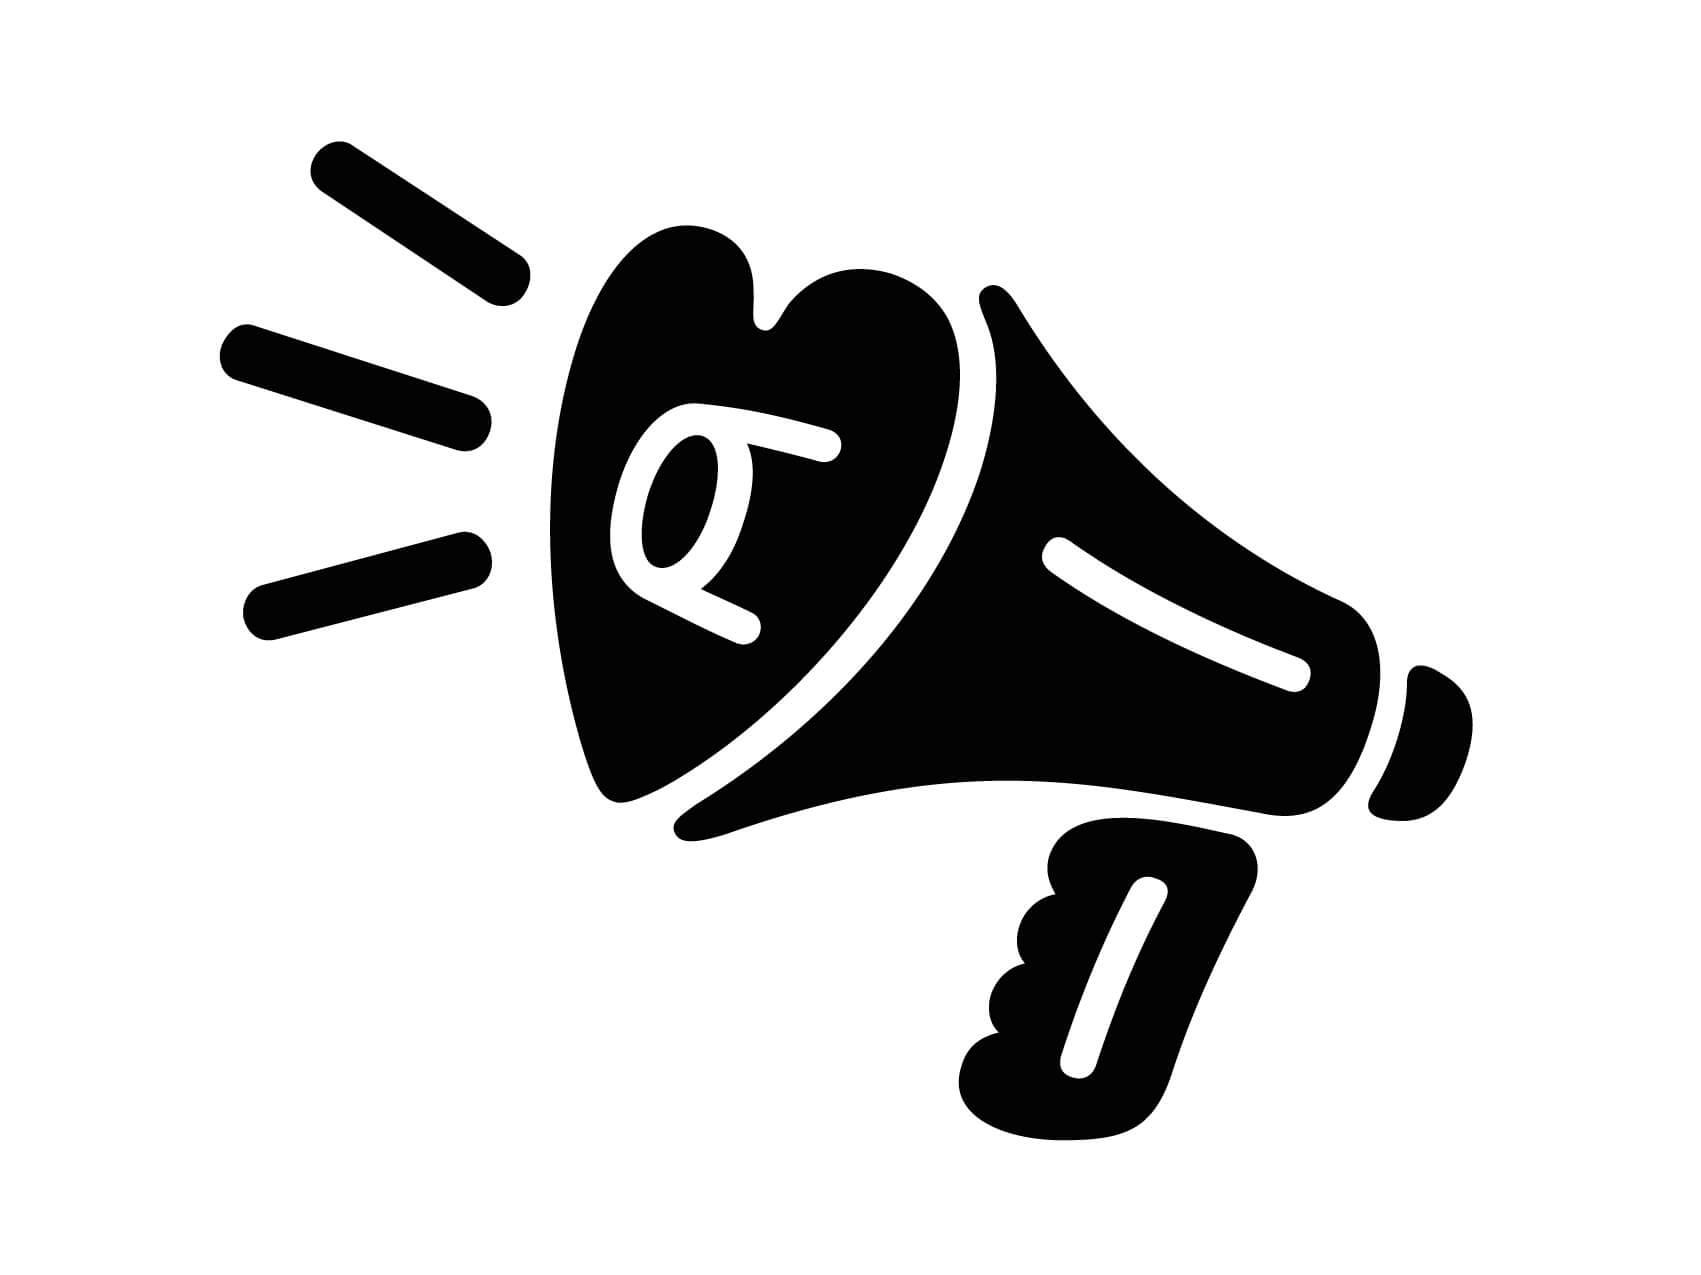 Stop Hate Speech (symbol pack 1/3) main image